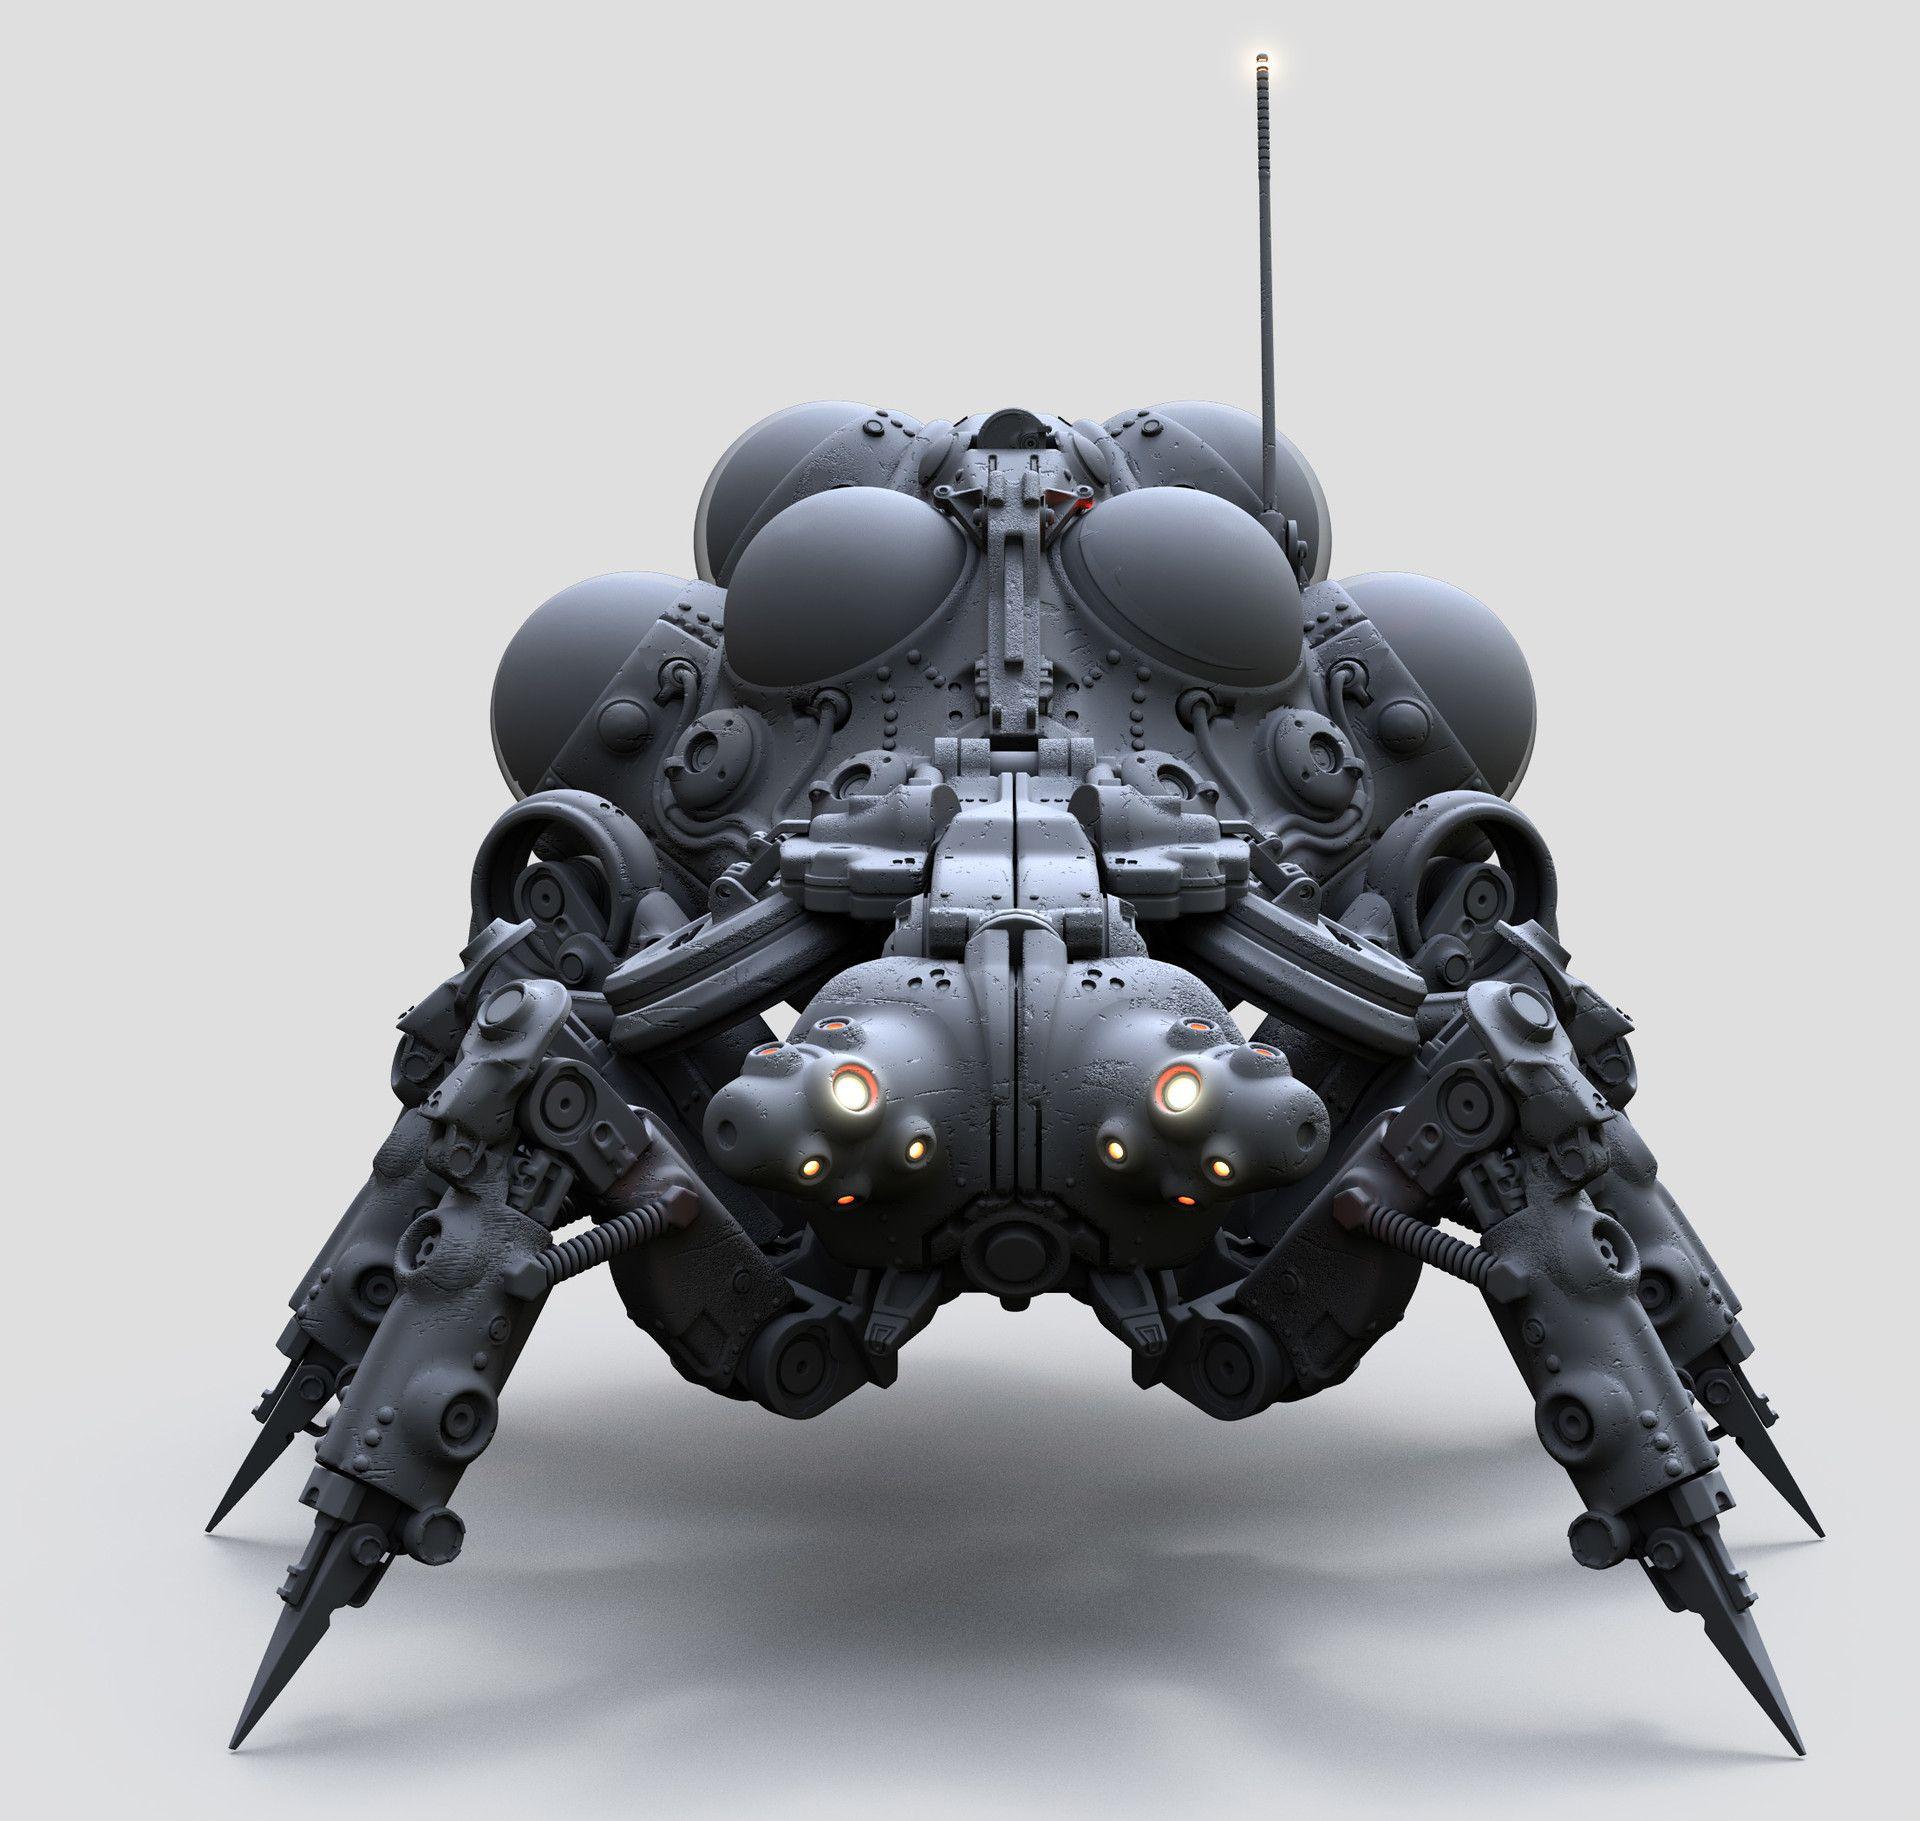 ArtStation - Mech per day: Robot nr3 AO renders, Tor Frick | concept ...